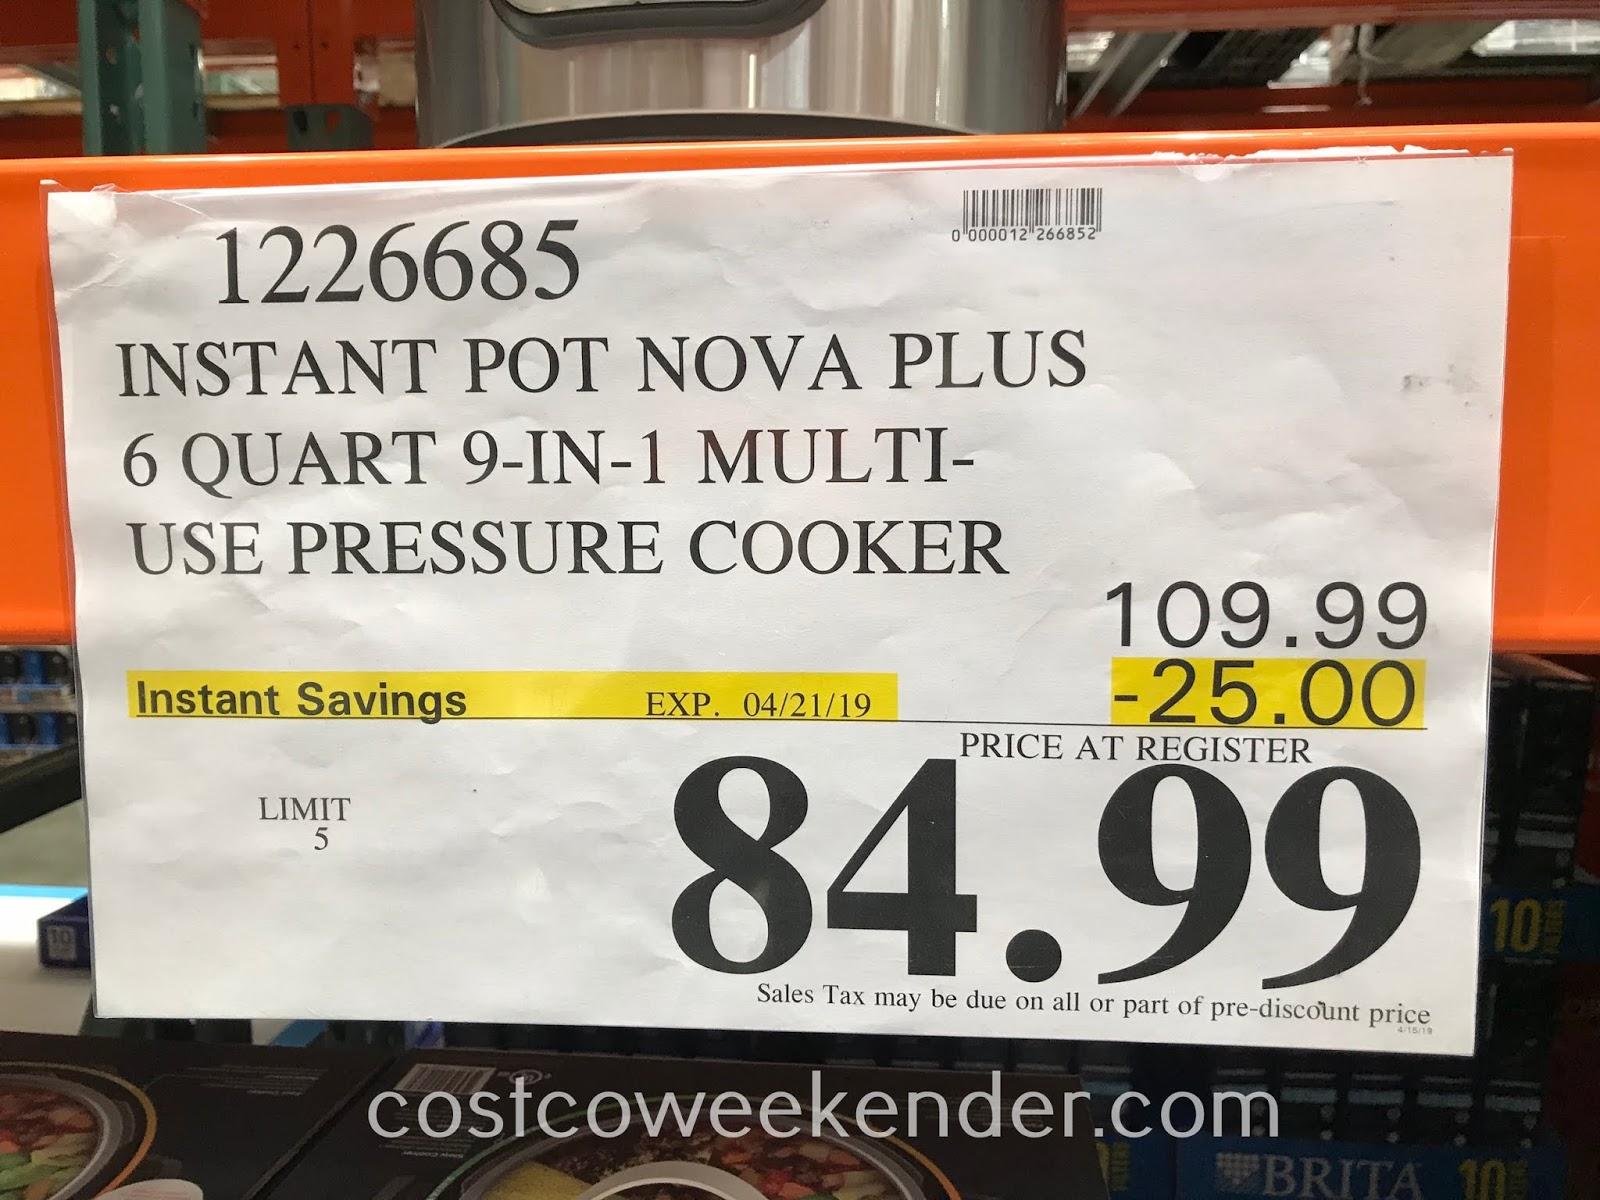 Deal for the Instant Pot Nova Plus 6qt 9-in-1 Pressure Cooker at Costco